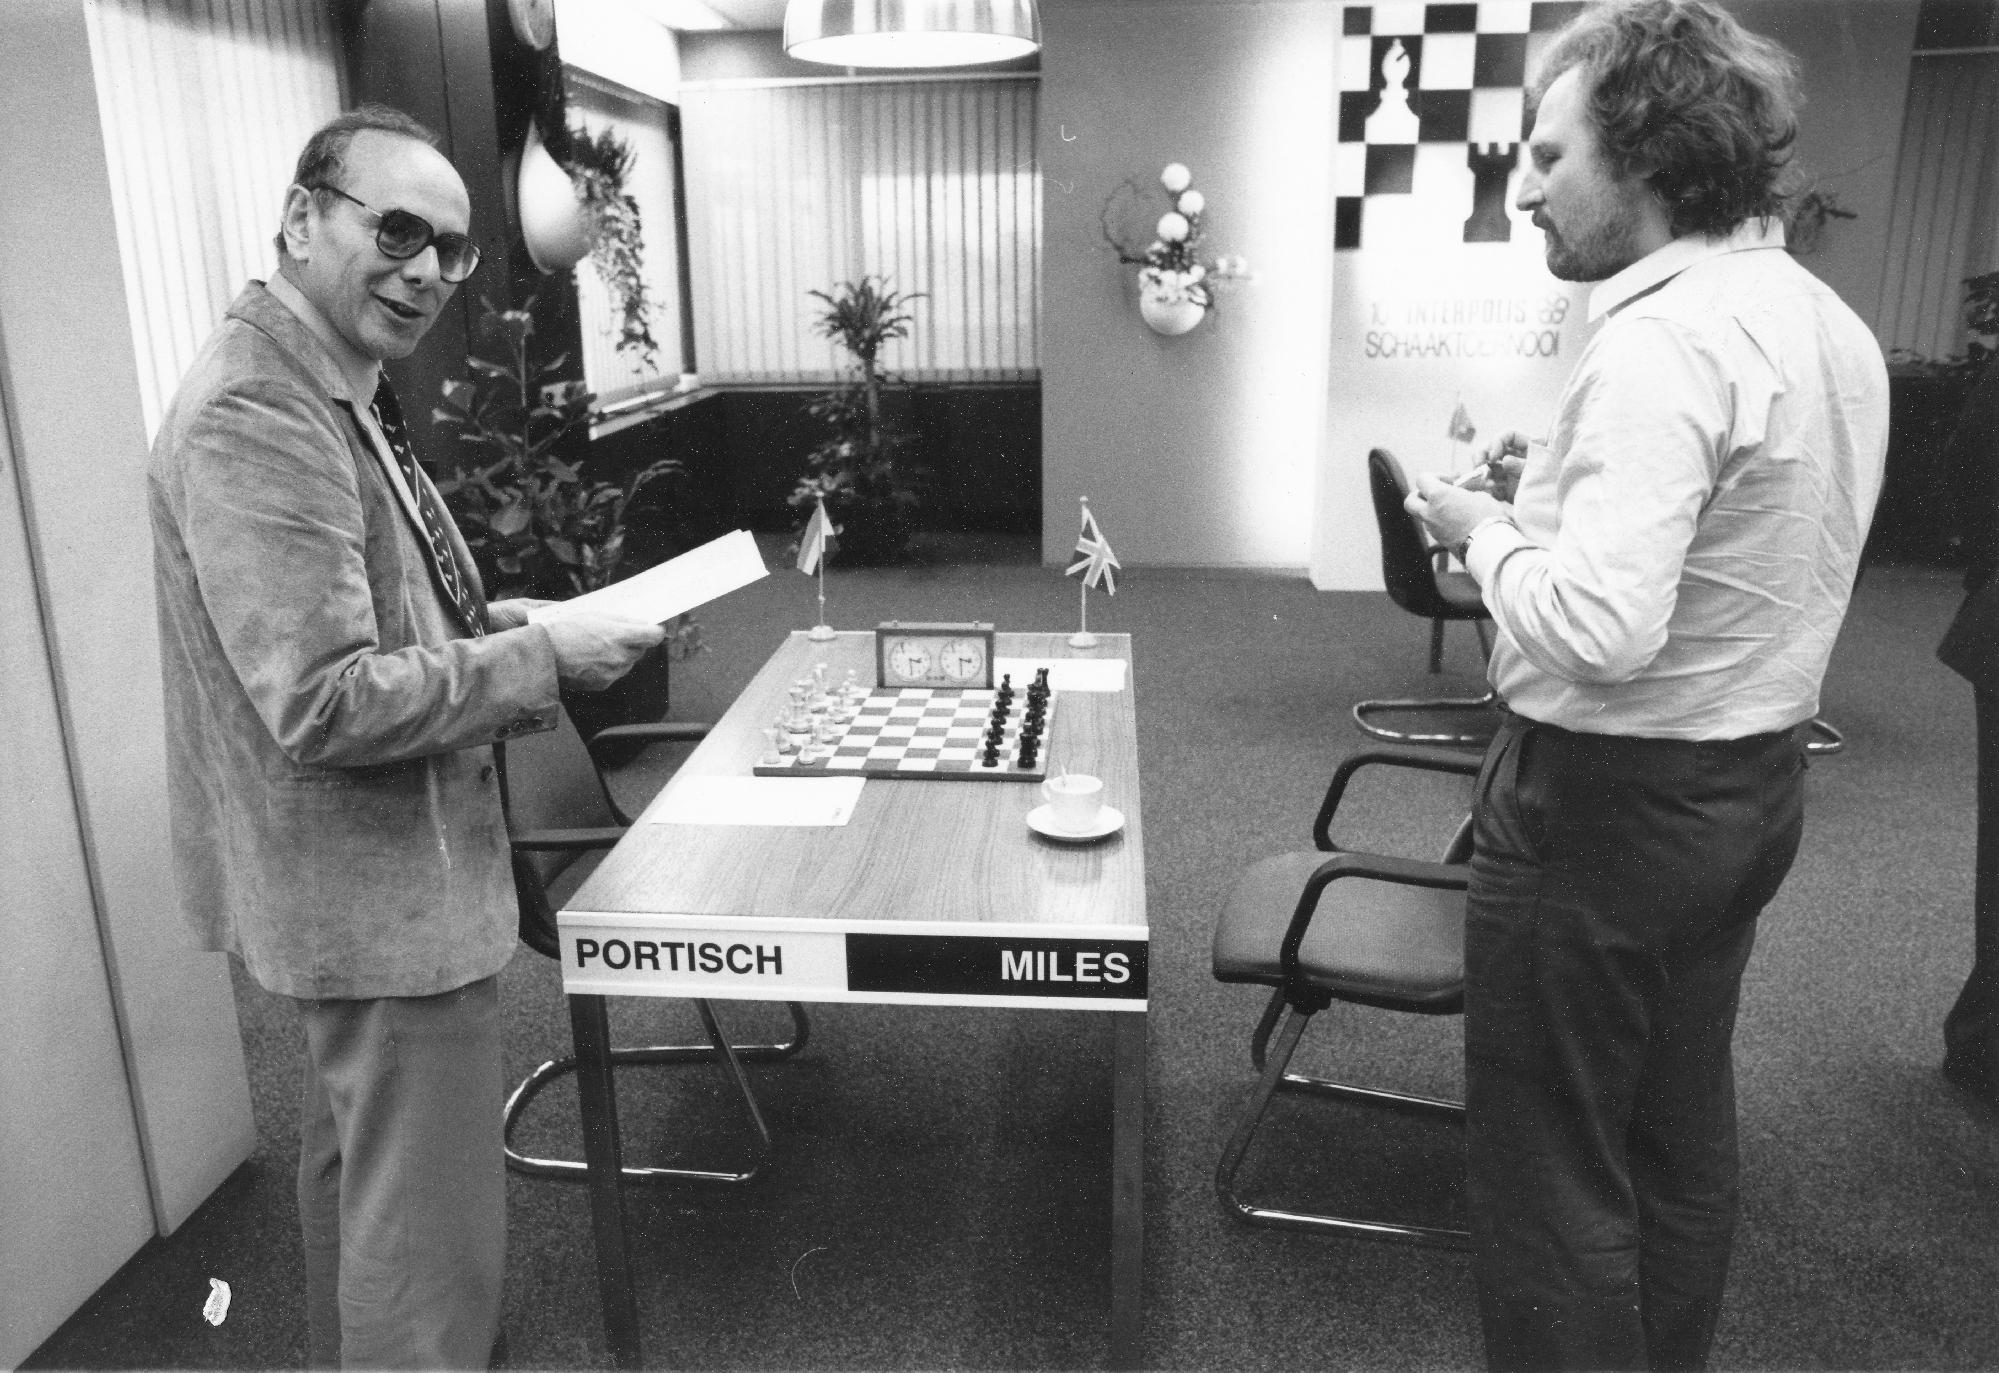 Lajos Portisch and Tony Miles